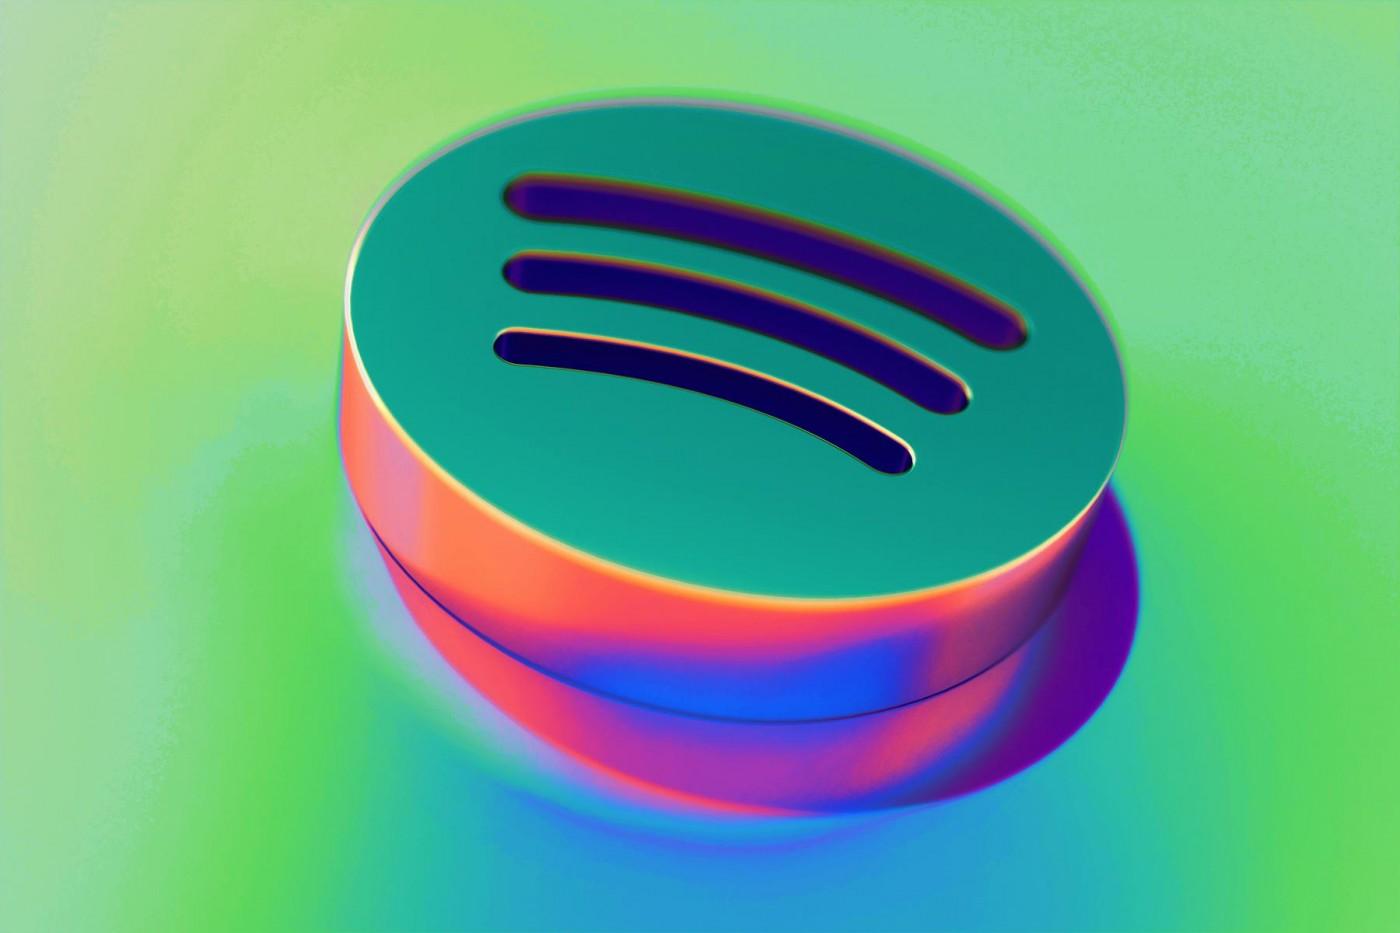 Spotify:讓音樂成為一種世界主義